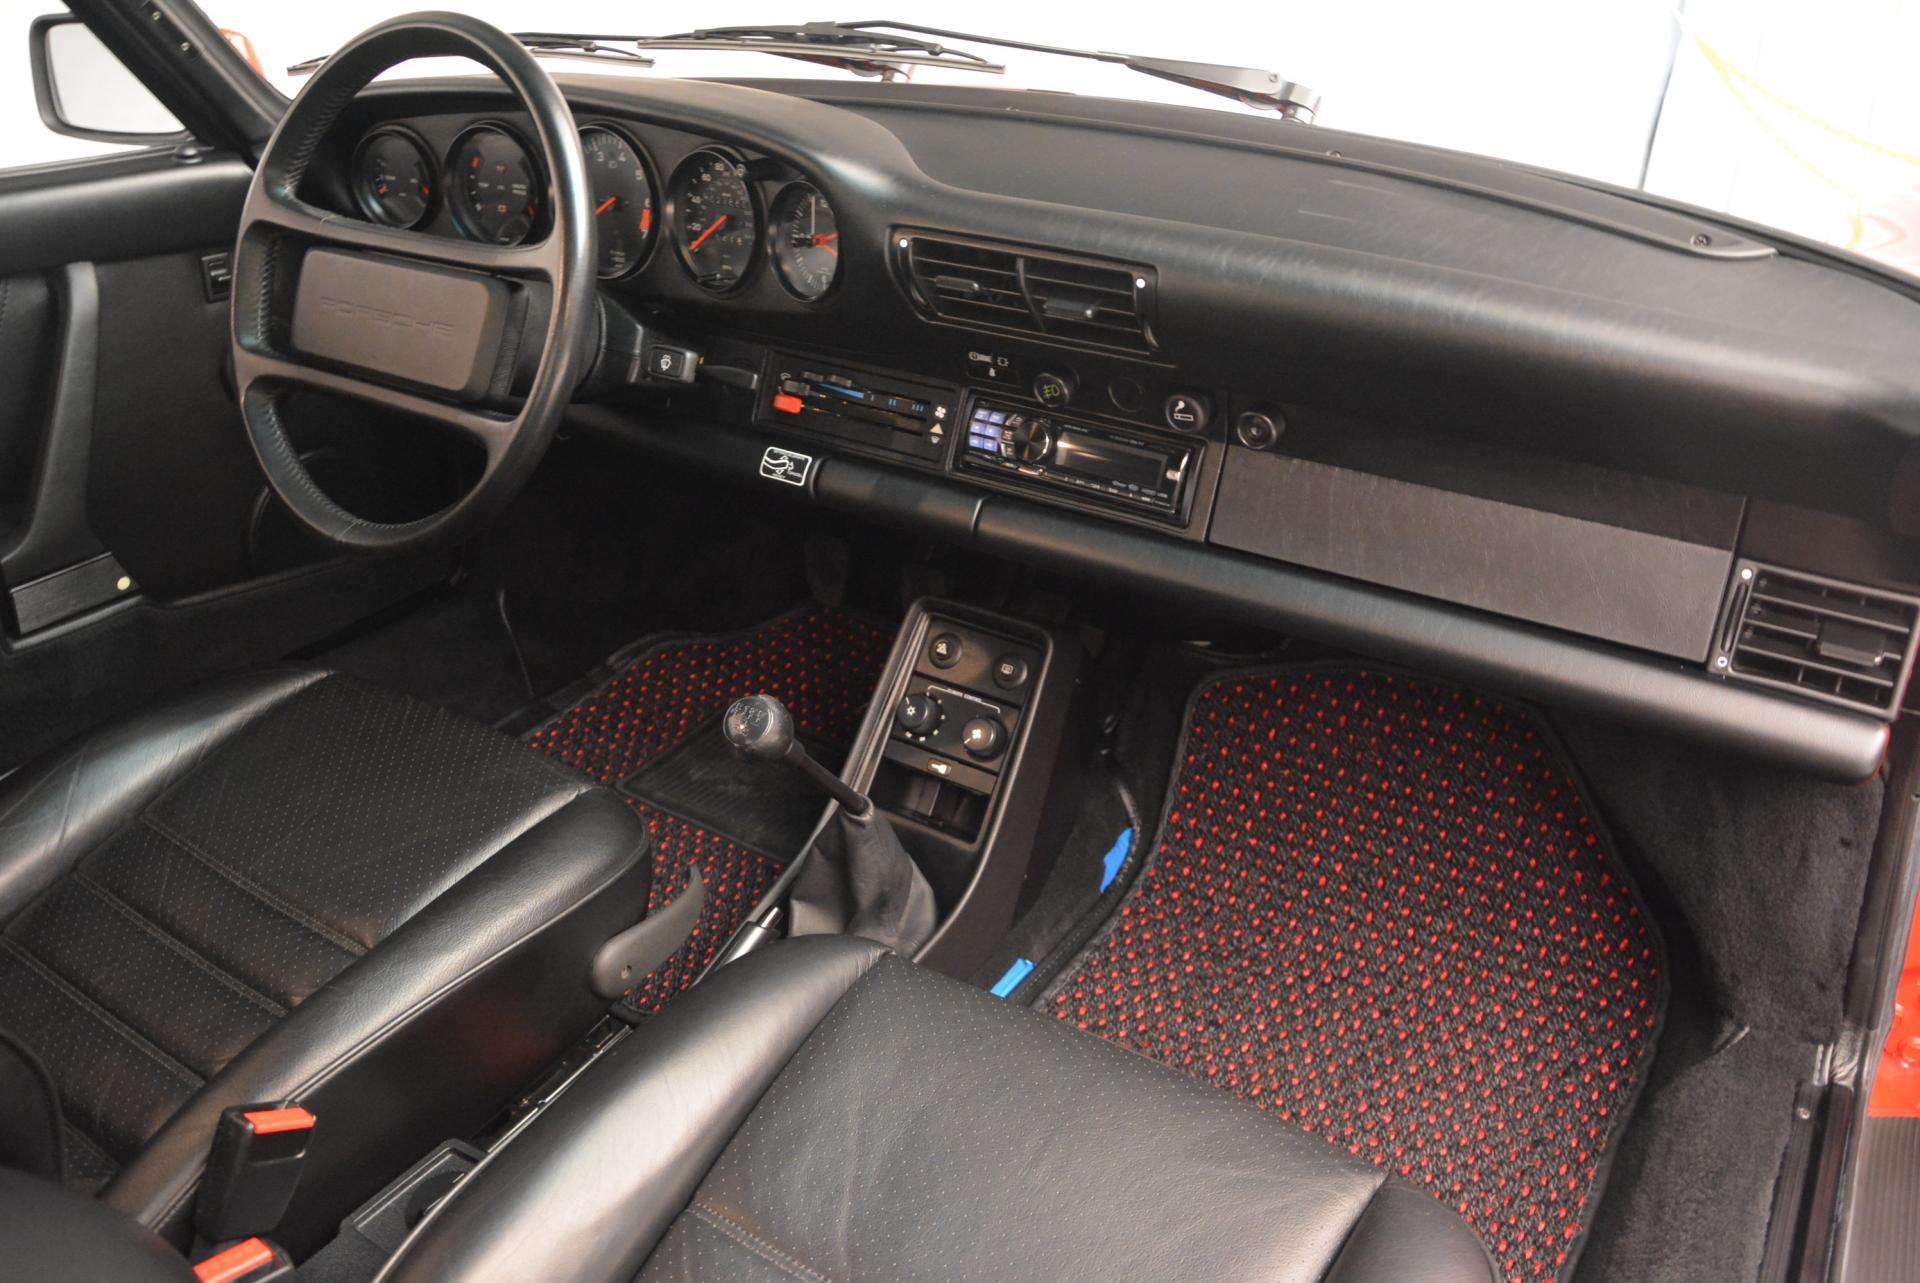 Used 1988 Porsche 911 Carrera For Sale 0 In Greenwich, CT